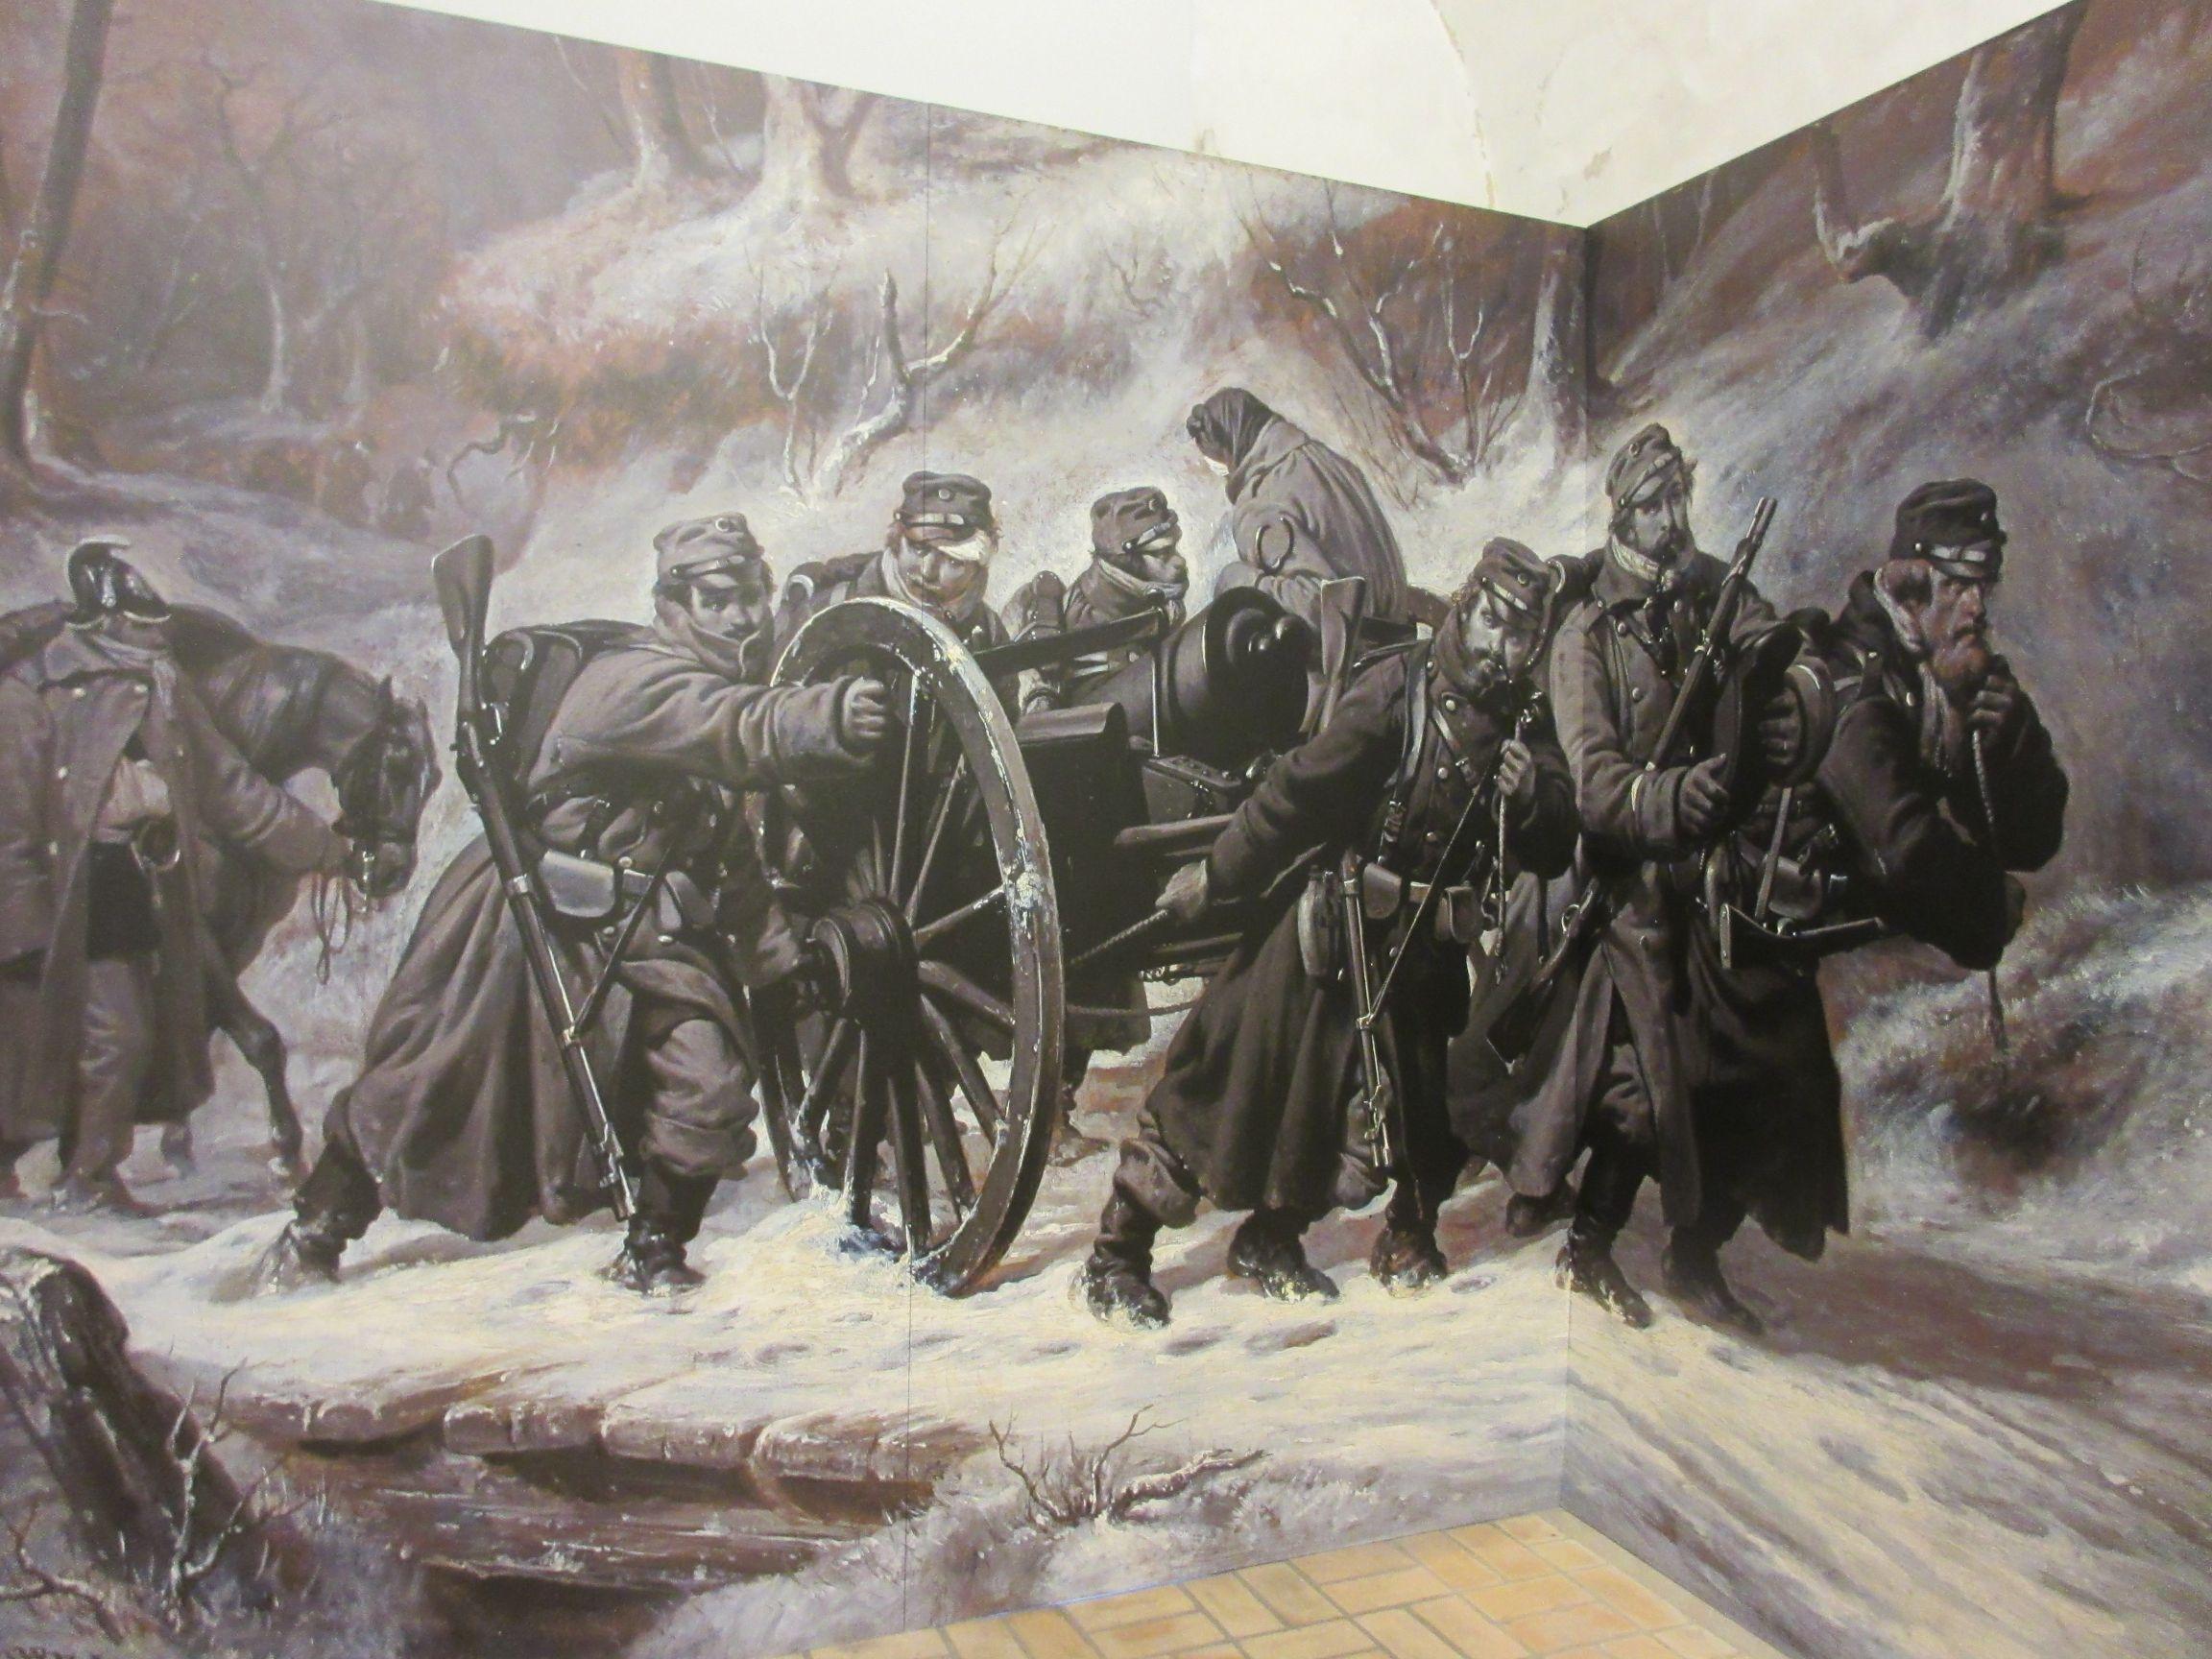 Dannevirke rømmes 1864